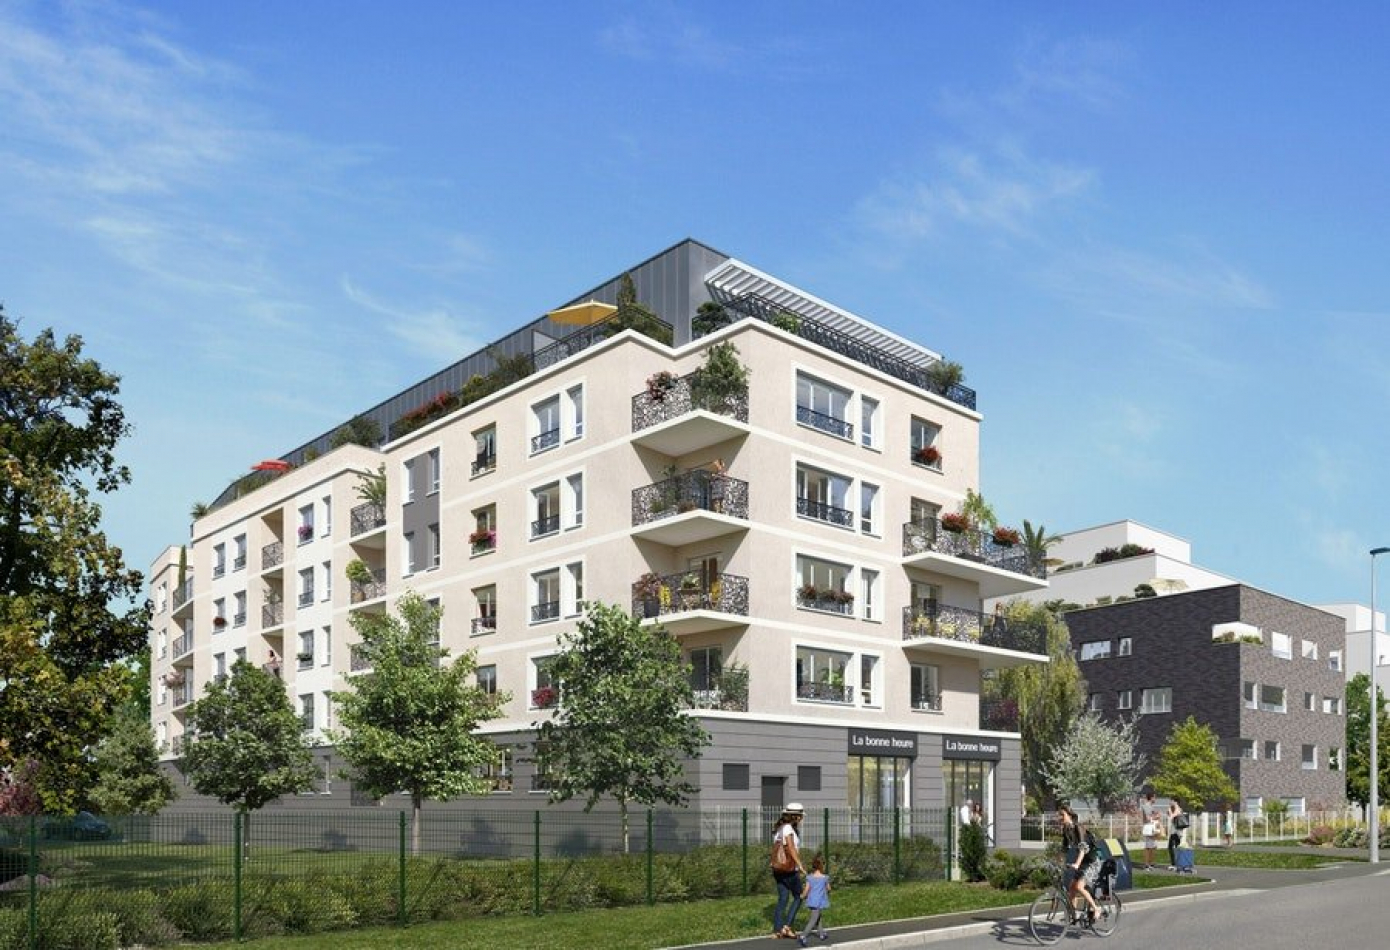 Programme neuf Villepinte Seine Saint Denis 7504238 Cj immobilier